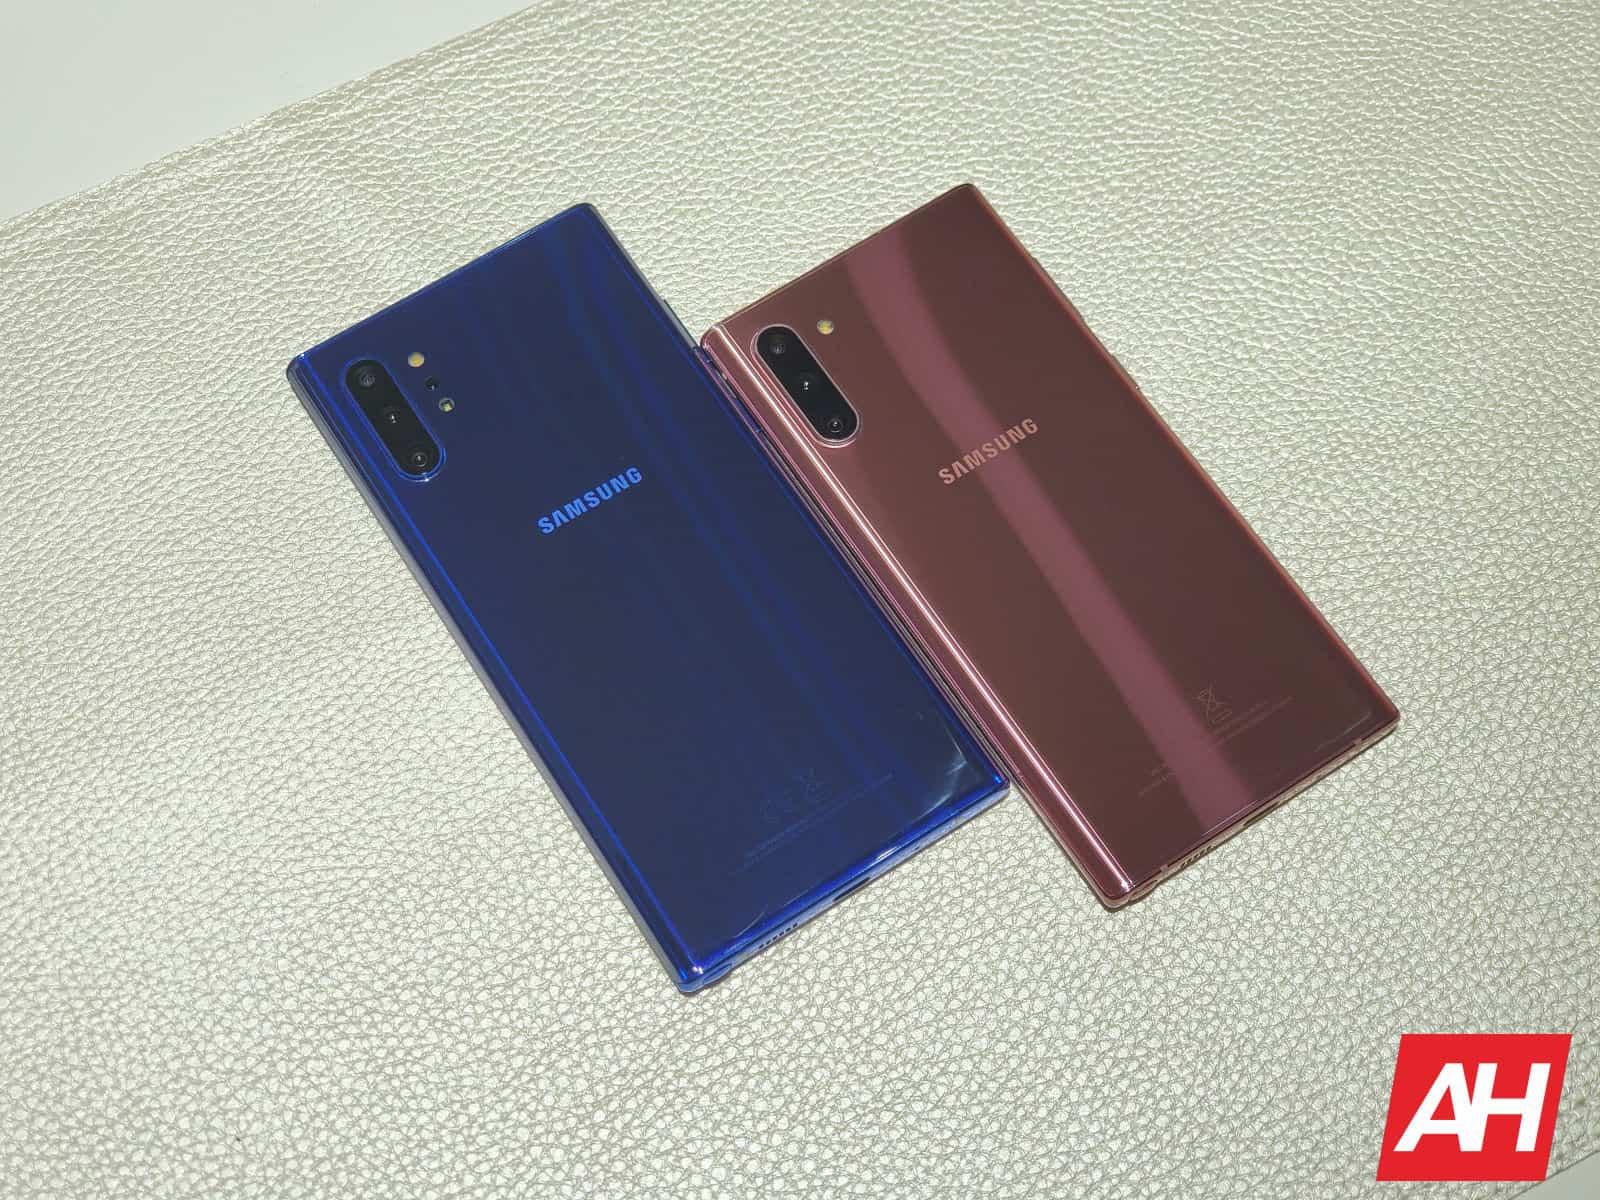 Samsung Galaxy Note 10 Colors AH 2019 6